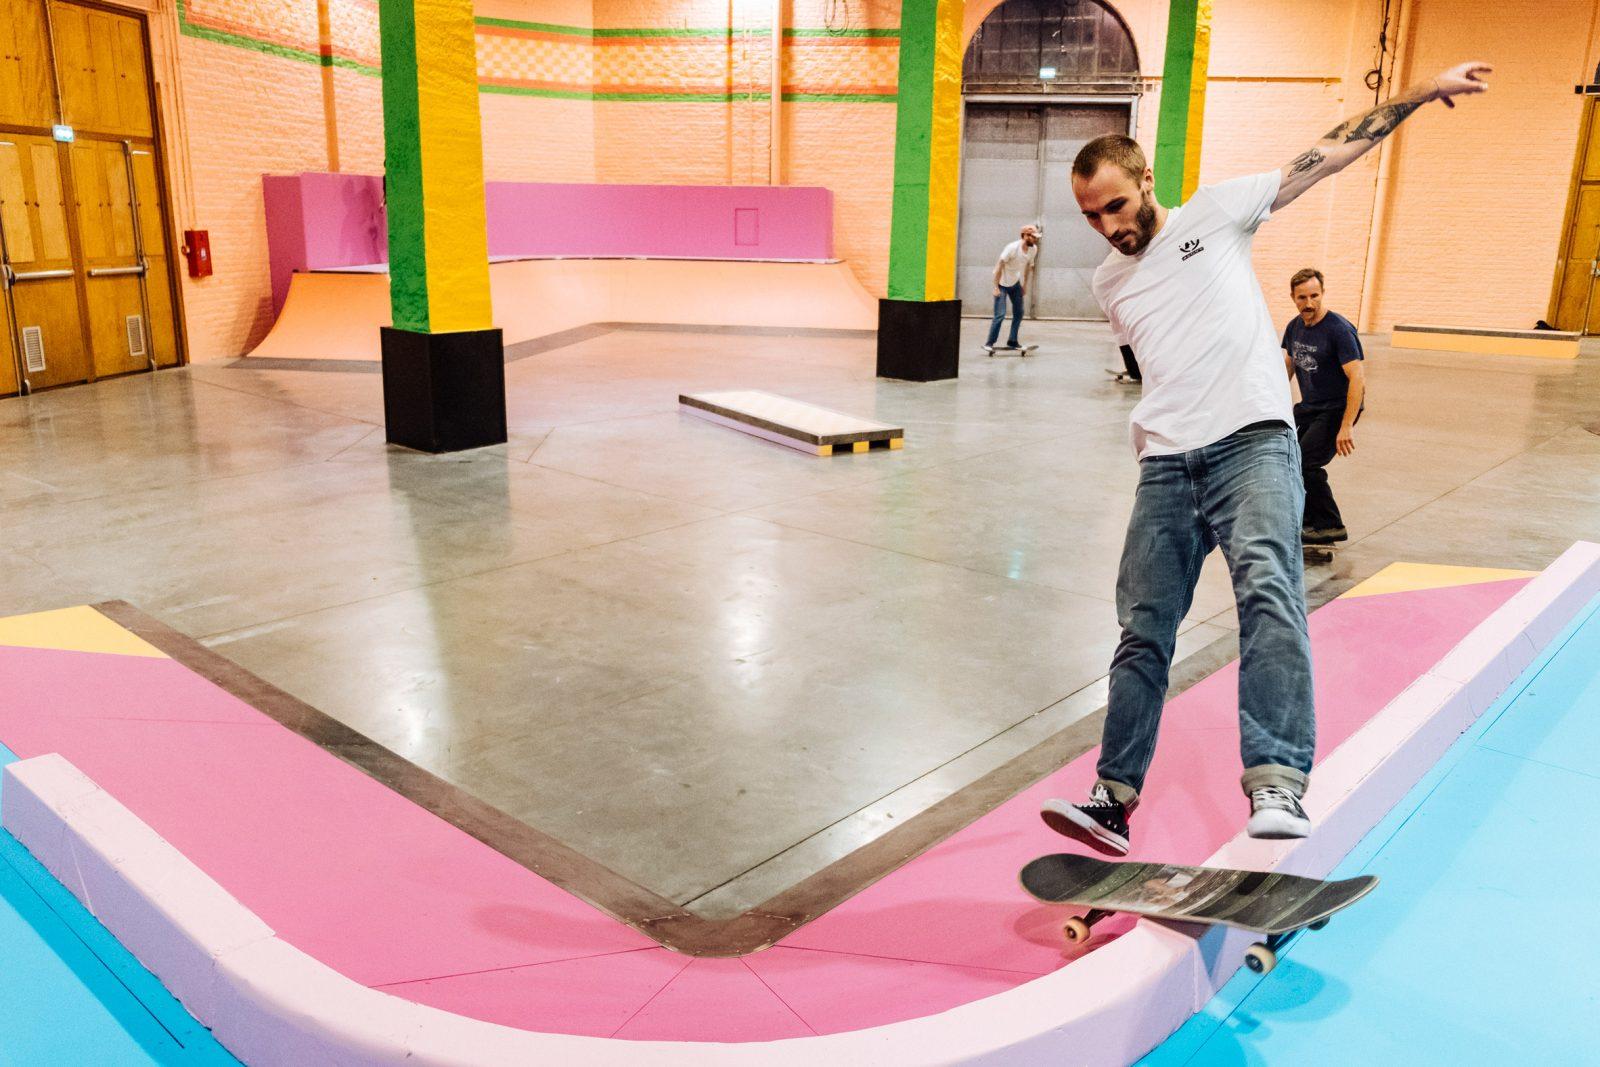 Yinka Ilori Skatepark at La Condition Publique, Lille France